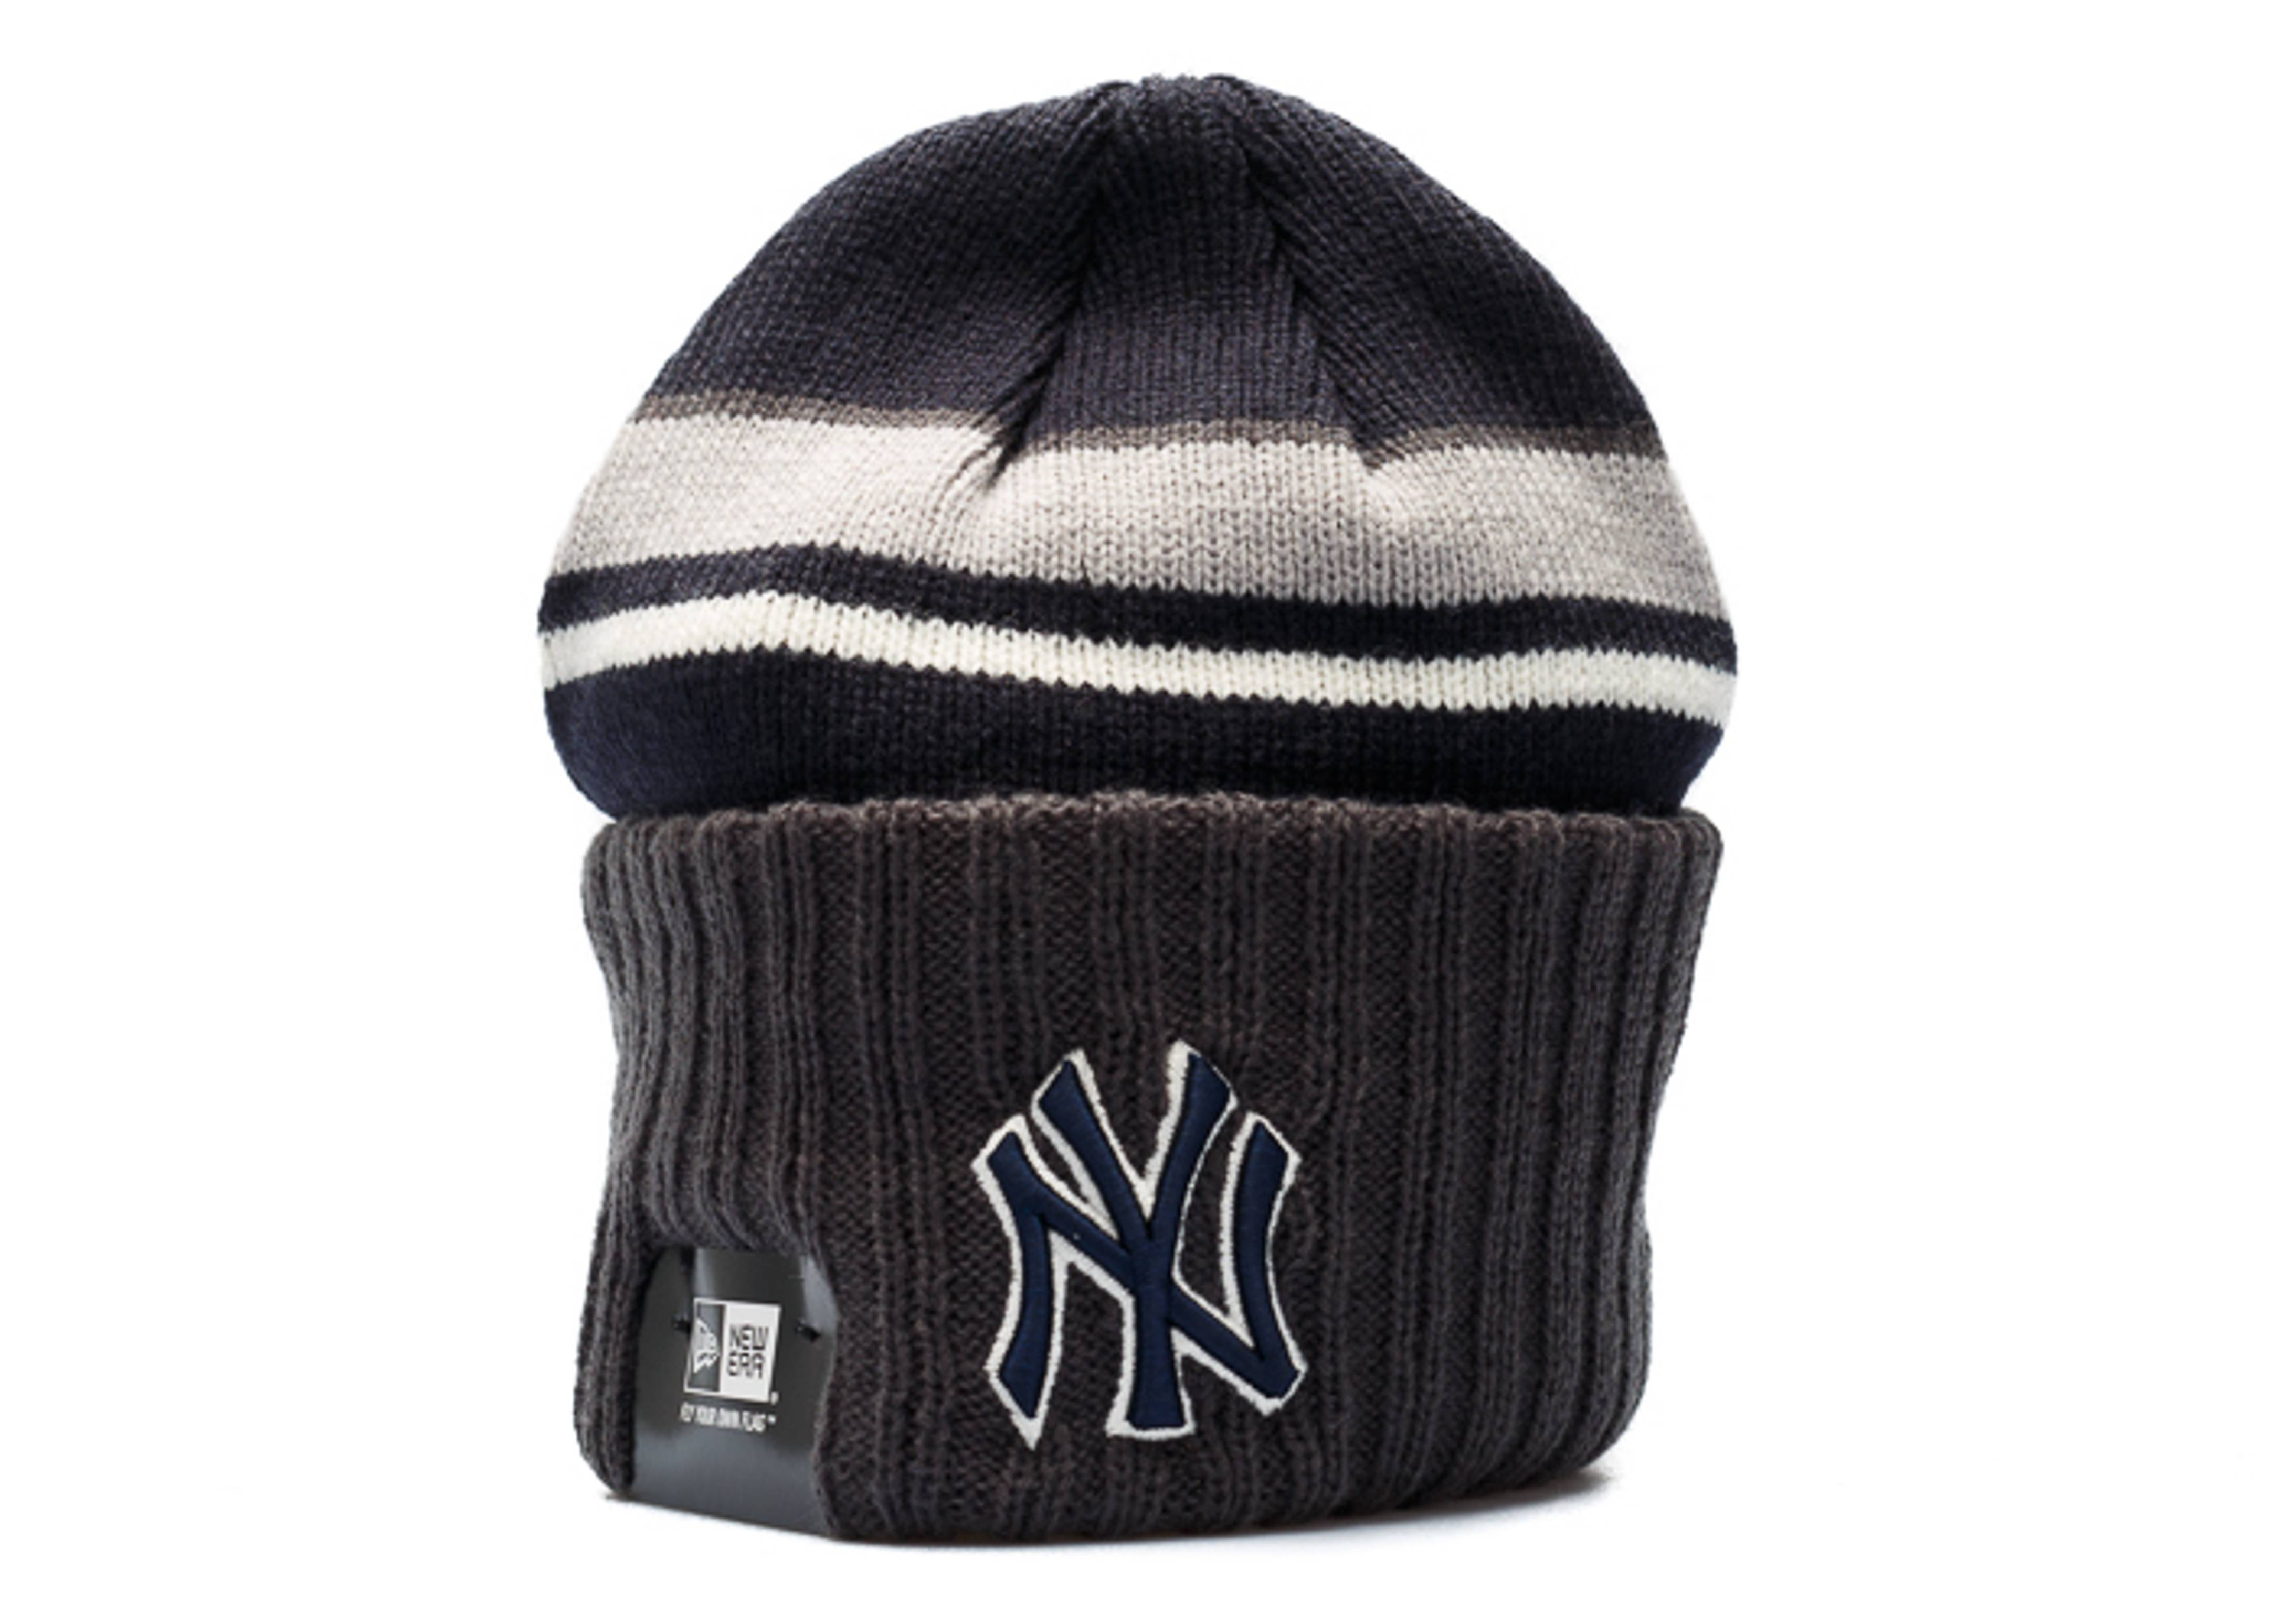 7432fbbab73 New era new york yankees knit cuffed beanie navy grey jpg 1600x1140 Yankee  cuffed beanie